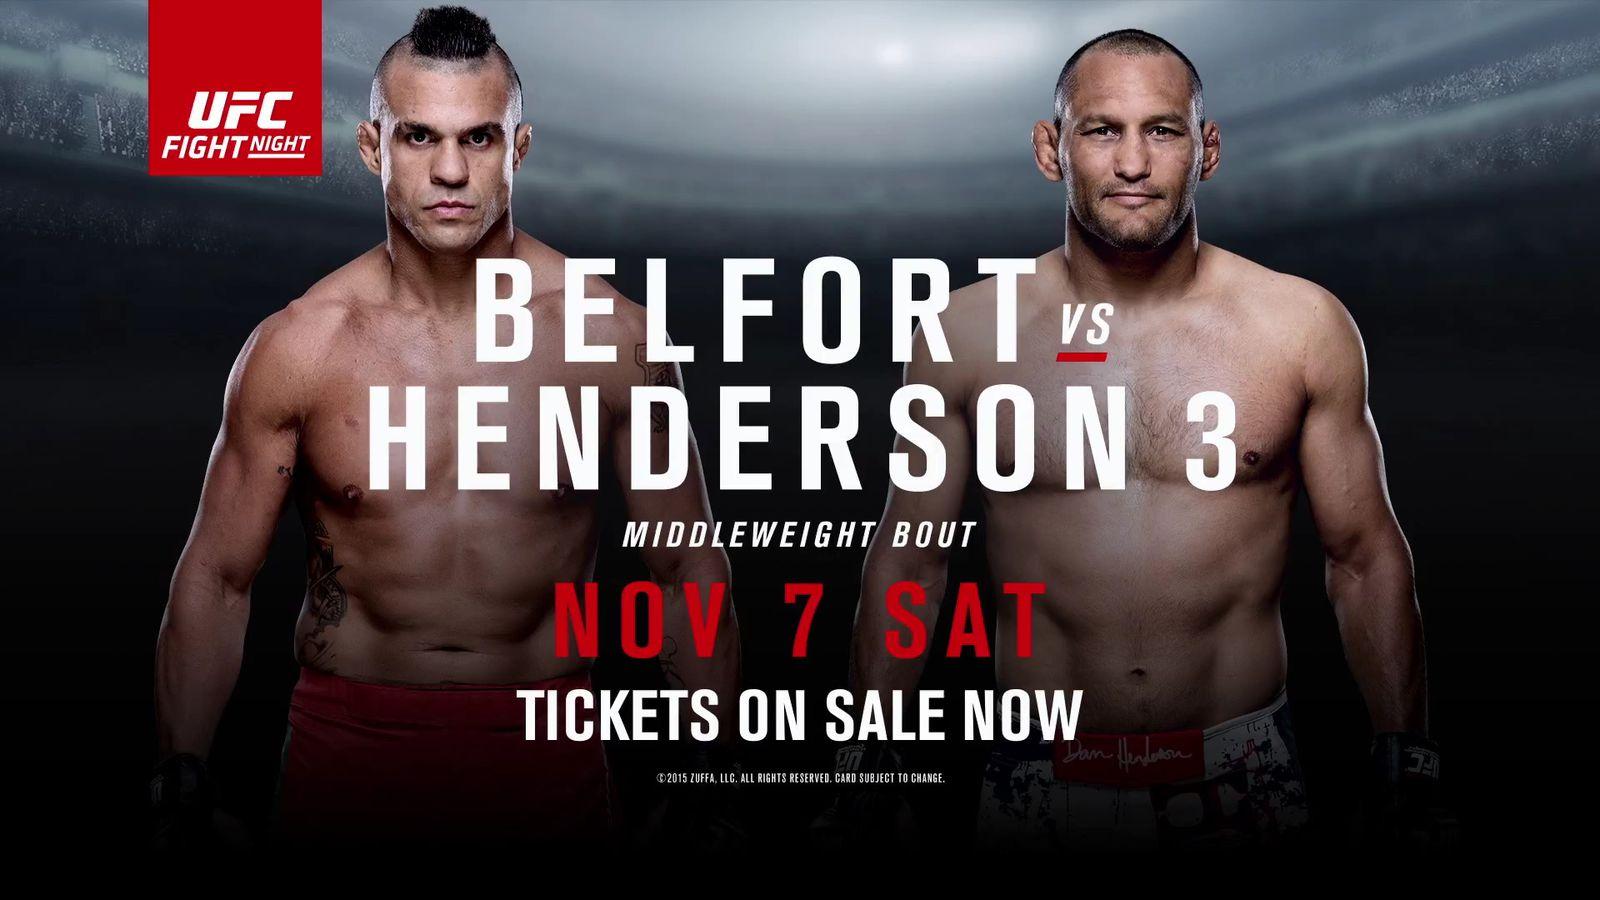 Belfort vs henderson betting odds betting odds roulette table rentals